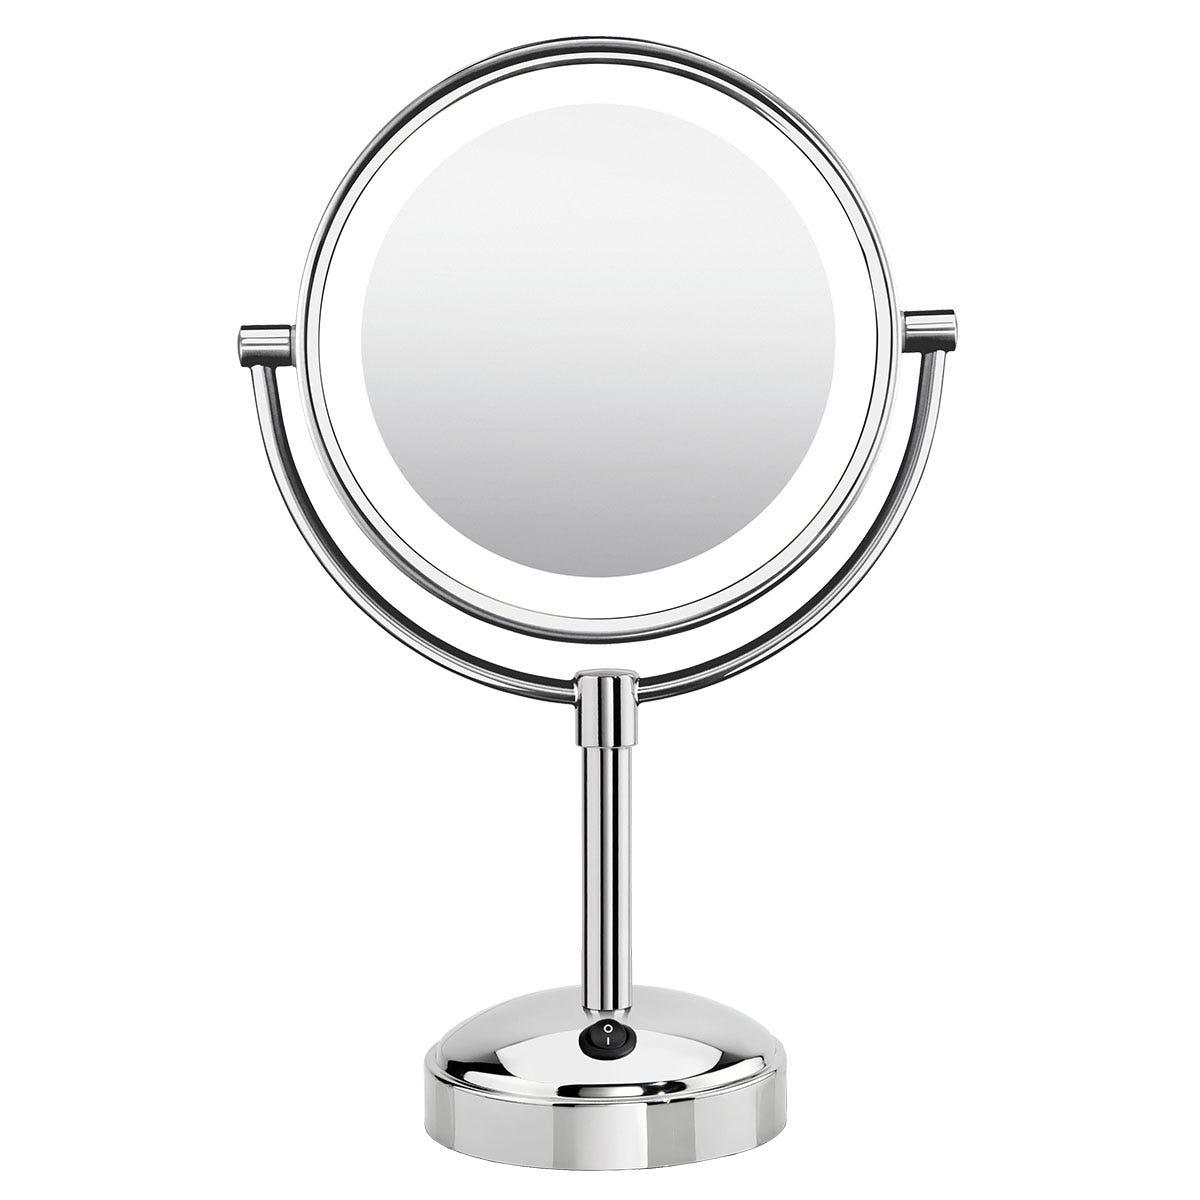 BaByliss BAB9434U Reflections Luxury LED Chrome Mirror - Silver